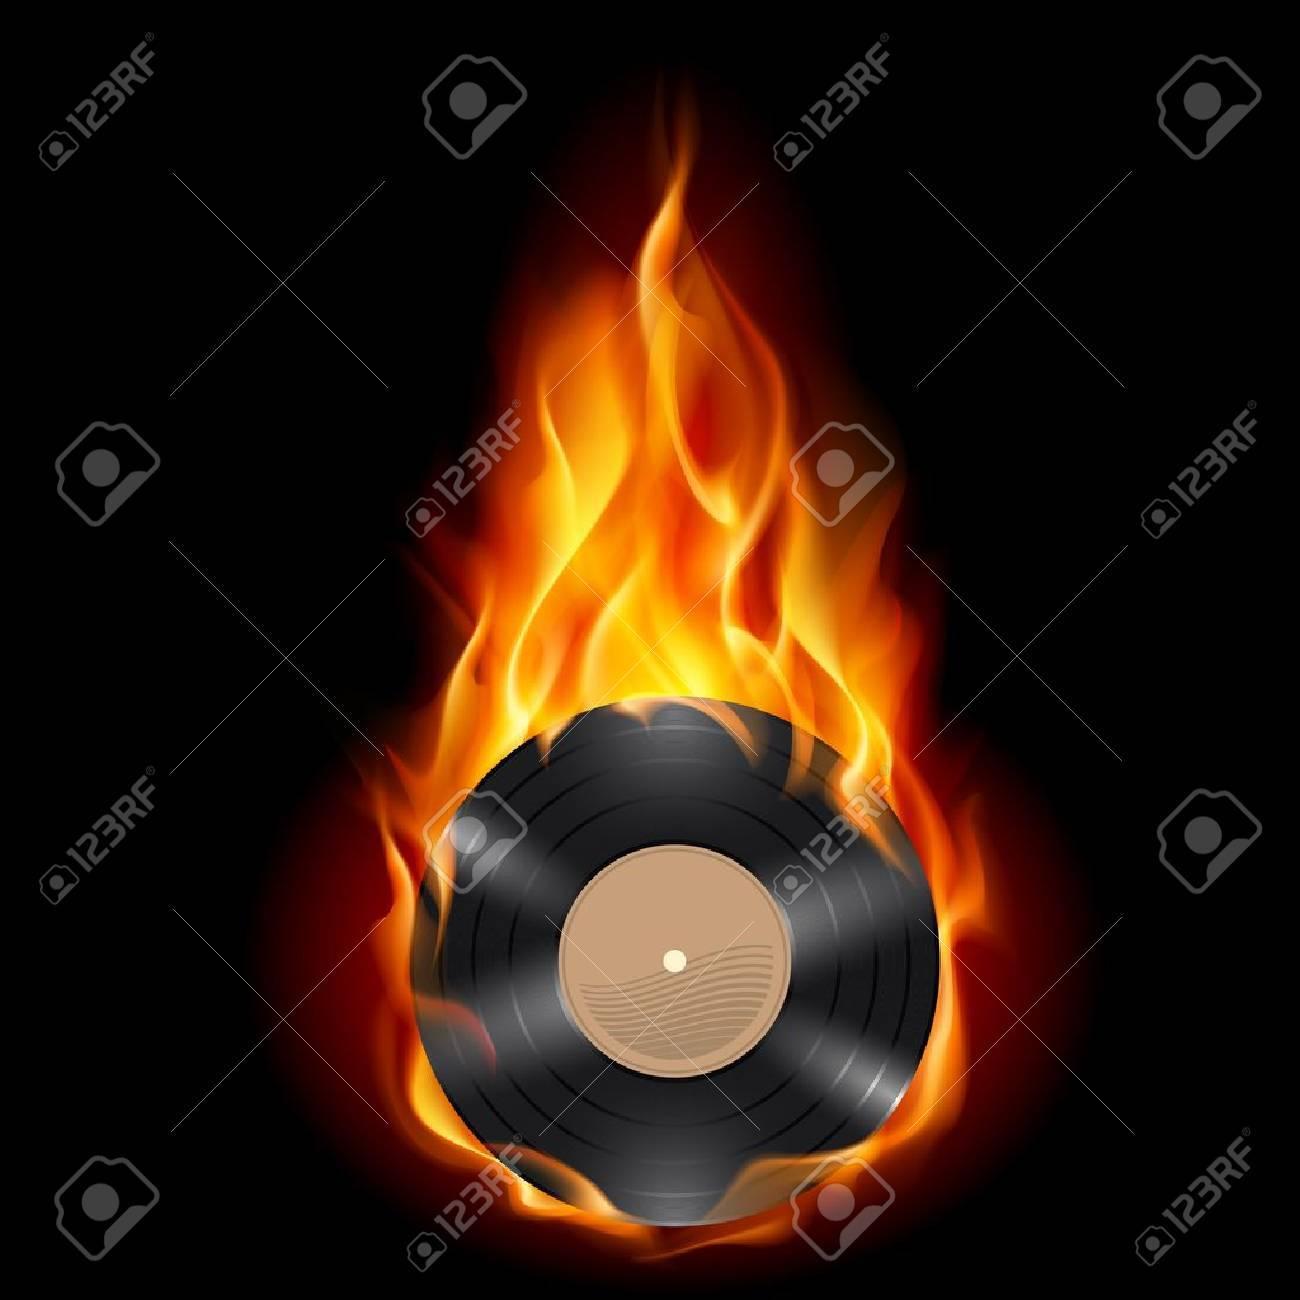 Vinyl record burning symbol. Illustration on black background Stock Vector - 10083108